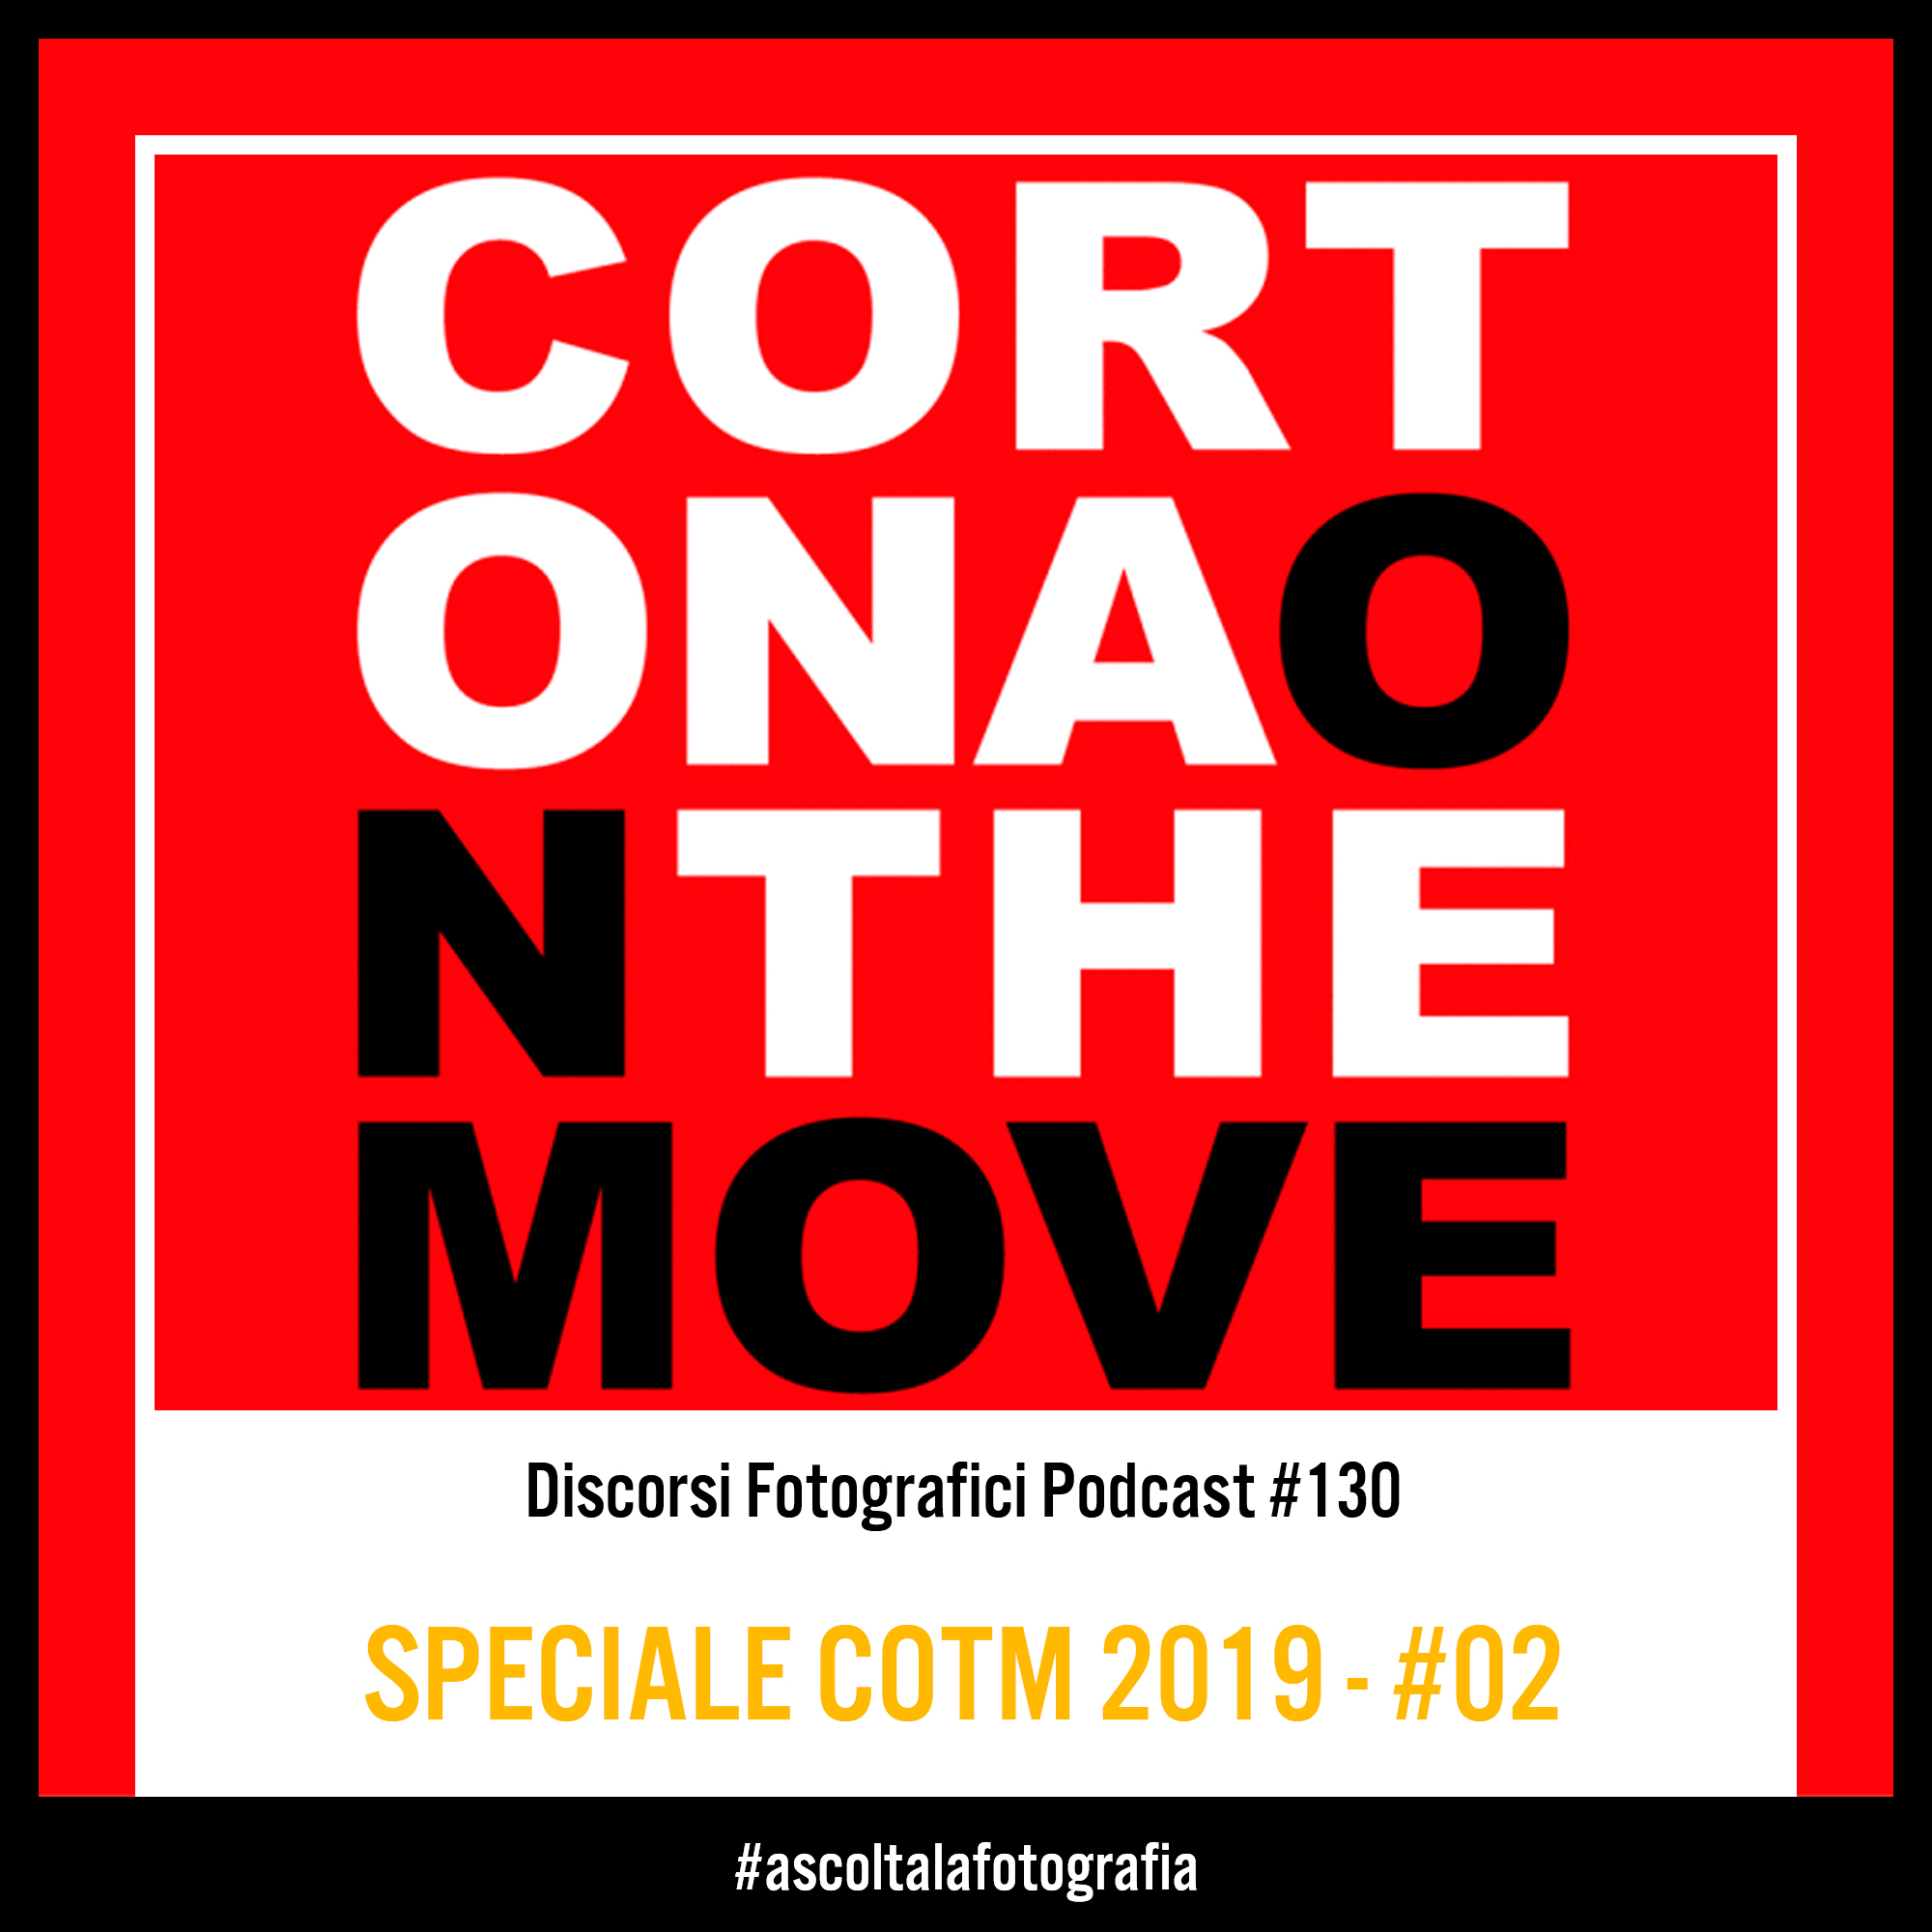 SPECIALE COTM 2019-#02